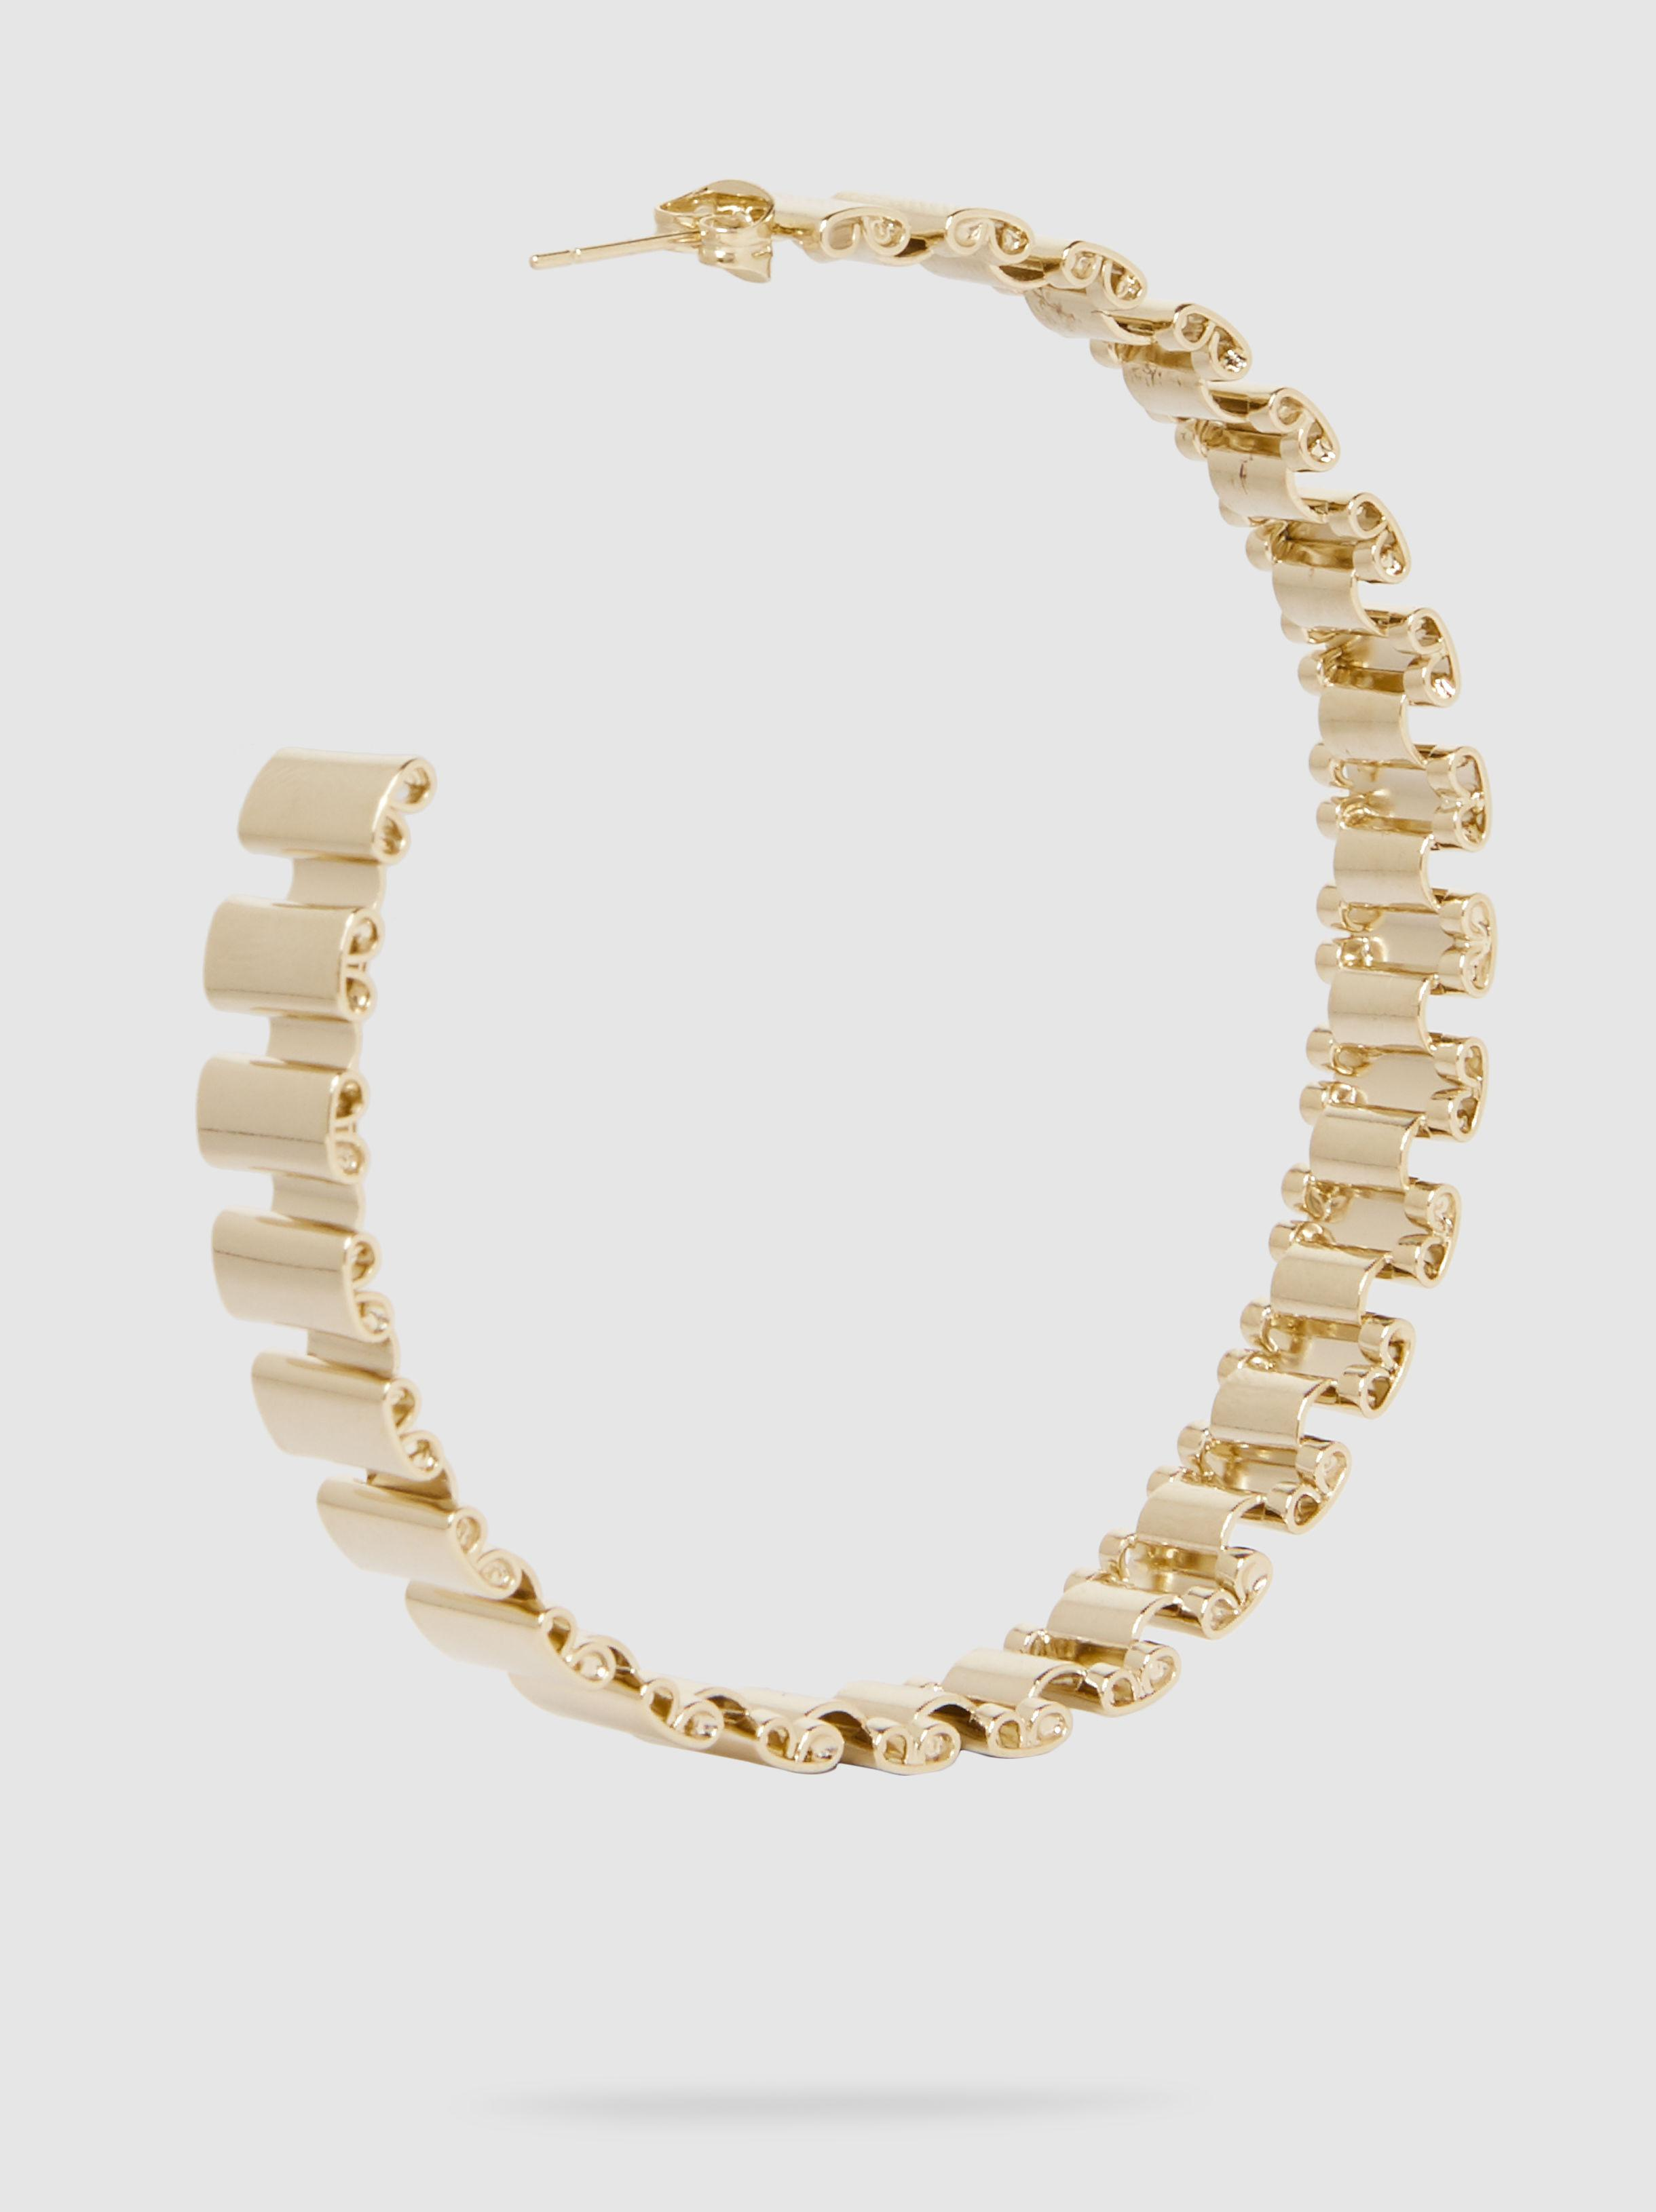 Casta Chain Link Gold-Tone Necklace Rosantica 2LzTyWuvbQ